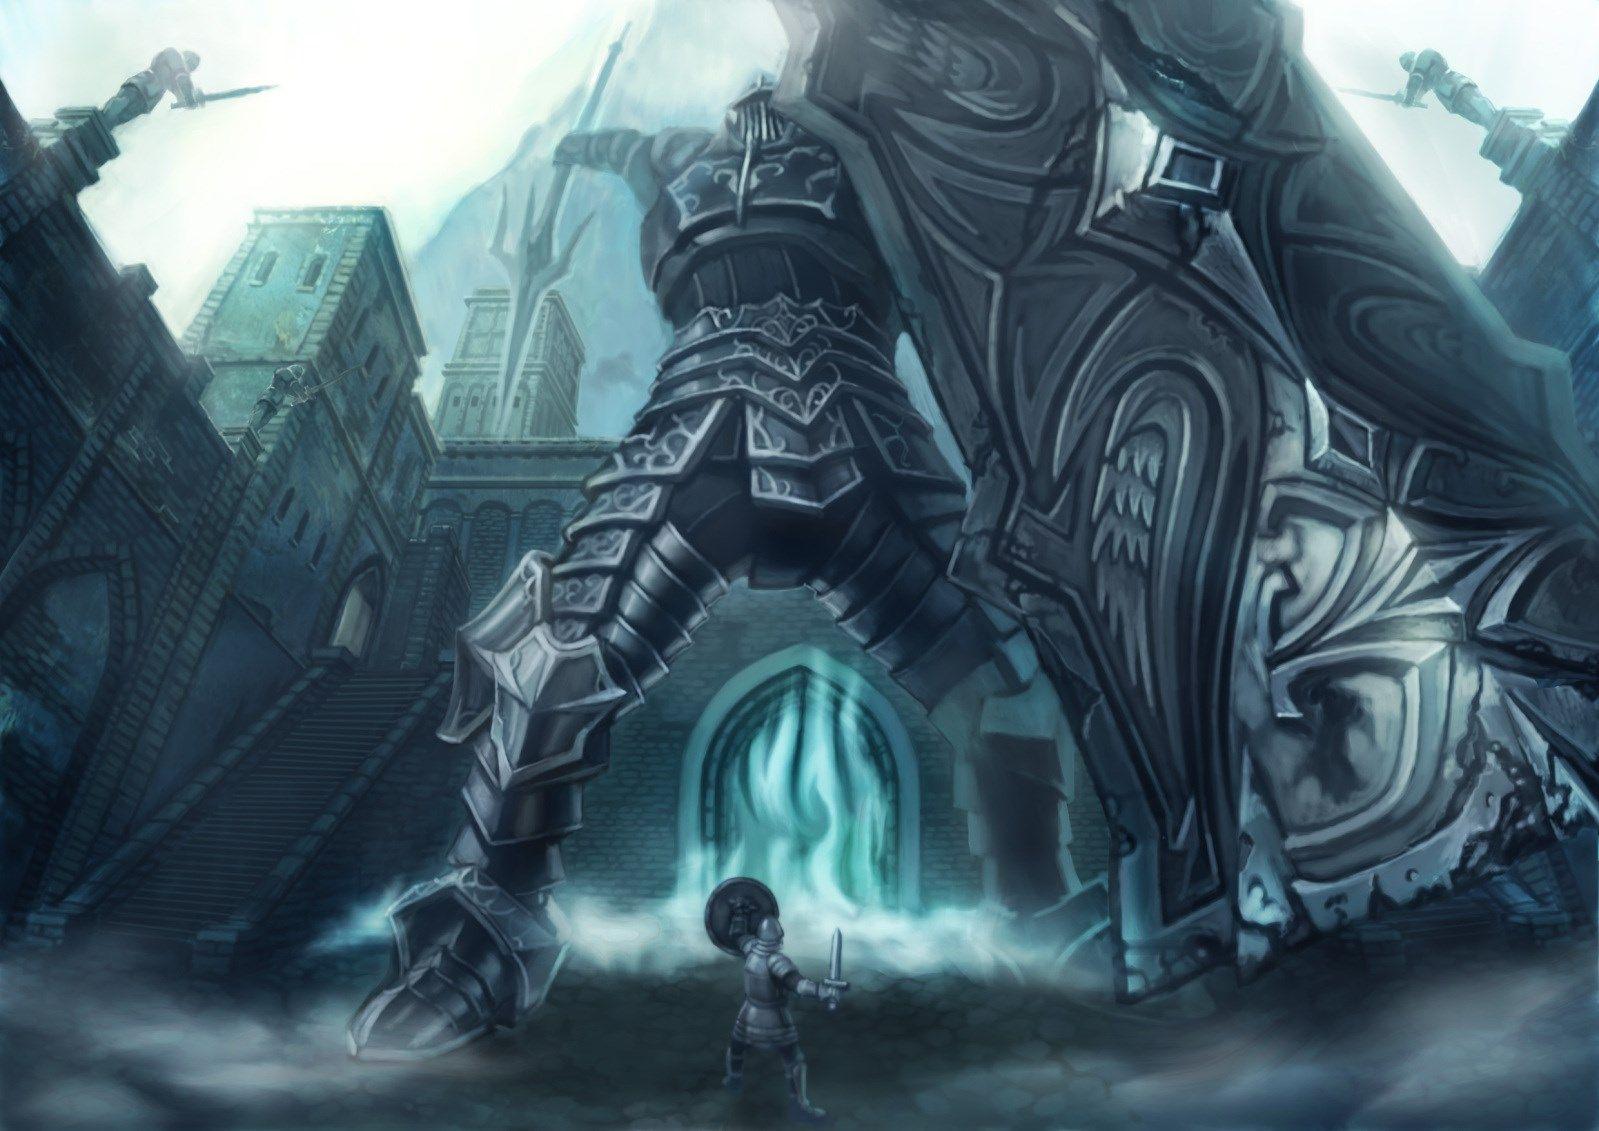 Backgrounds High Resolution Demons Souls Wallpaper 1599x1131 257 Kb Tower Knight Demon Souls Dark Souls Meme